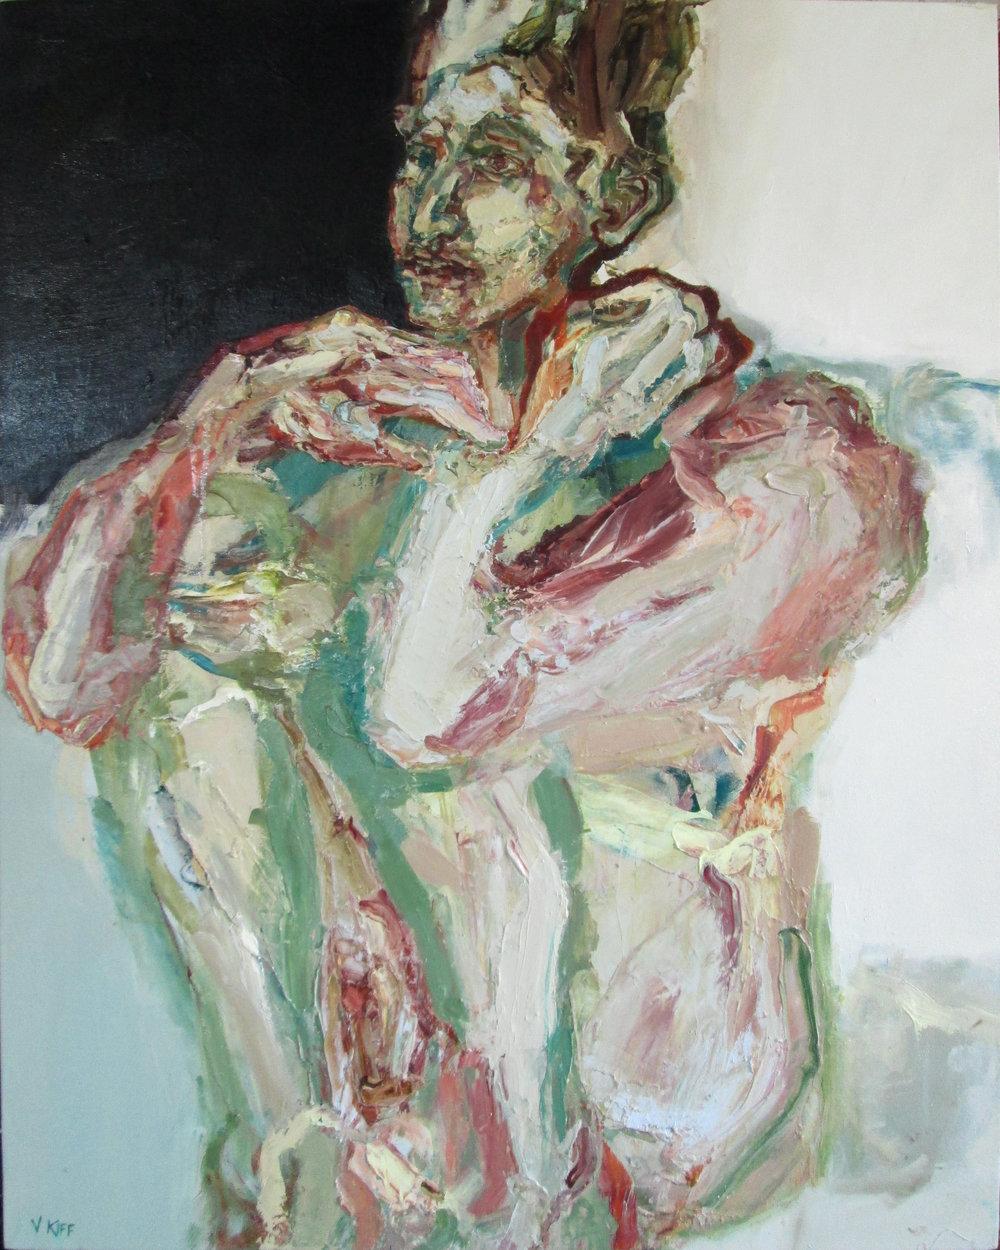 Title: Ayr Stone, Green-White  Size: 125 x 83 cm  Medium: Oil on canvas  Price: £3500